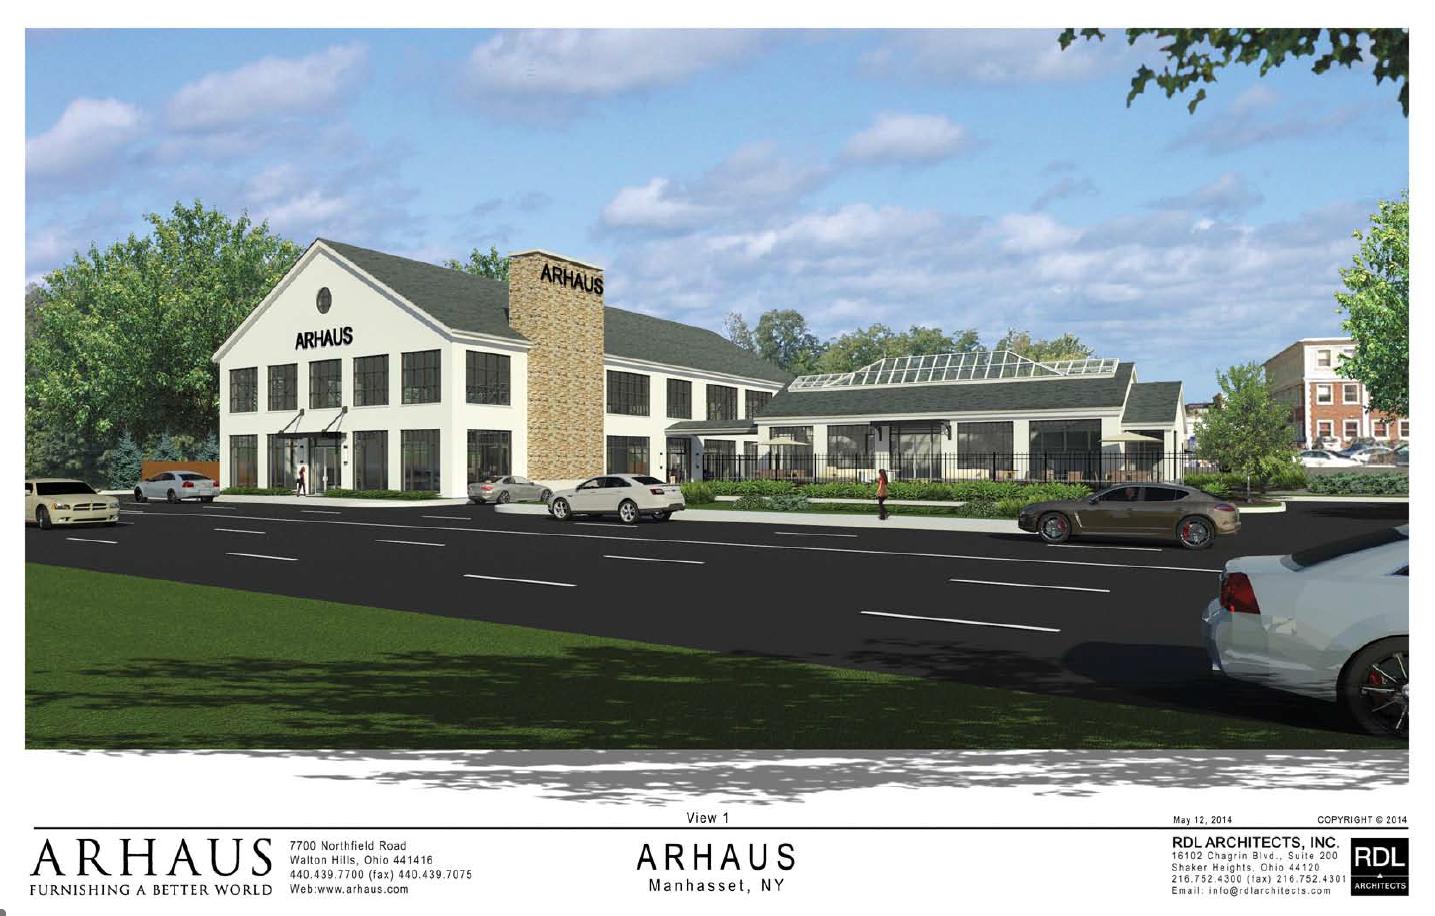 Arhaus Preserves History Renovating The Former Port Motors Building In  Roslyn, New York